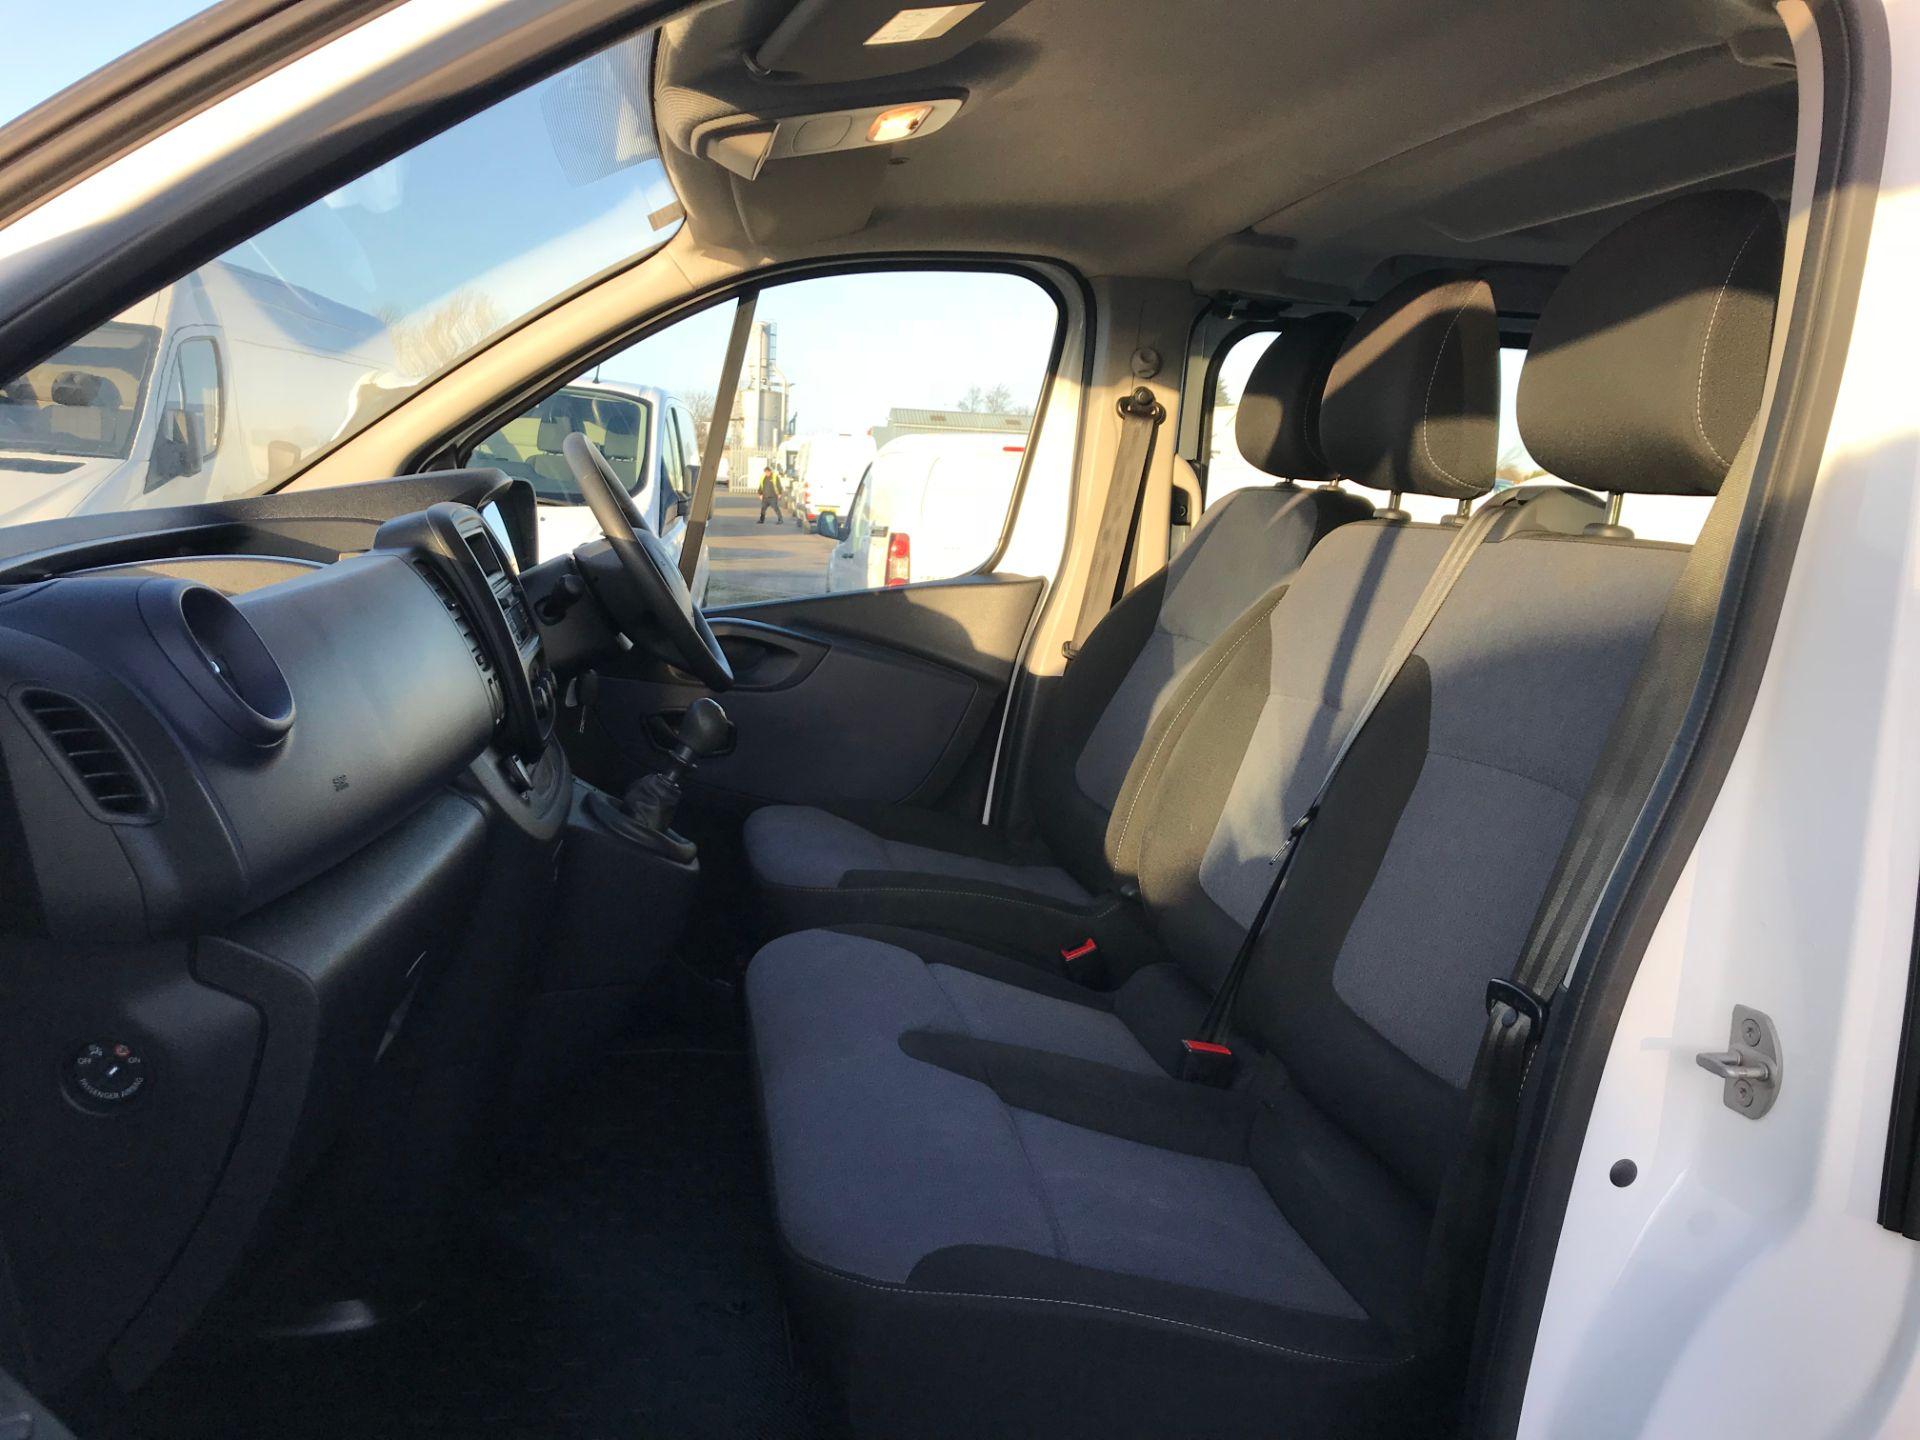 2017 Vauxhall Vivaro 2900 1.6Cdti Biturbo 125Ps H1 Combi 9 Seat (DY17UGS) Image 13